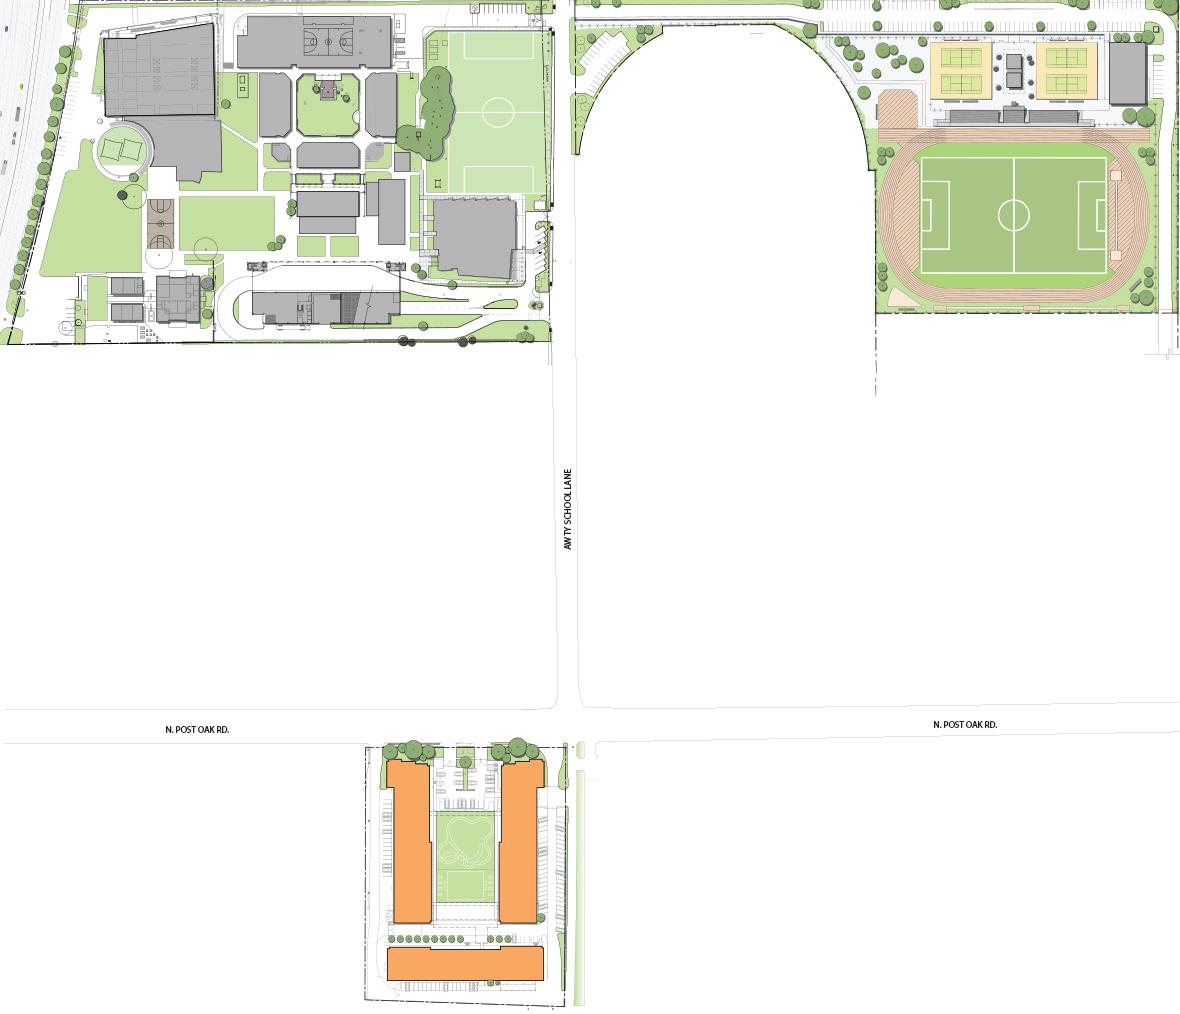 School Campus Map.Campus Map The Awty International School Houston